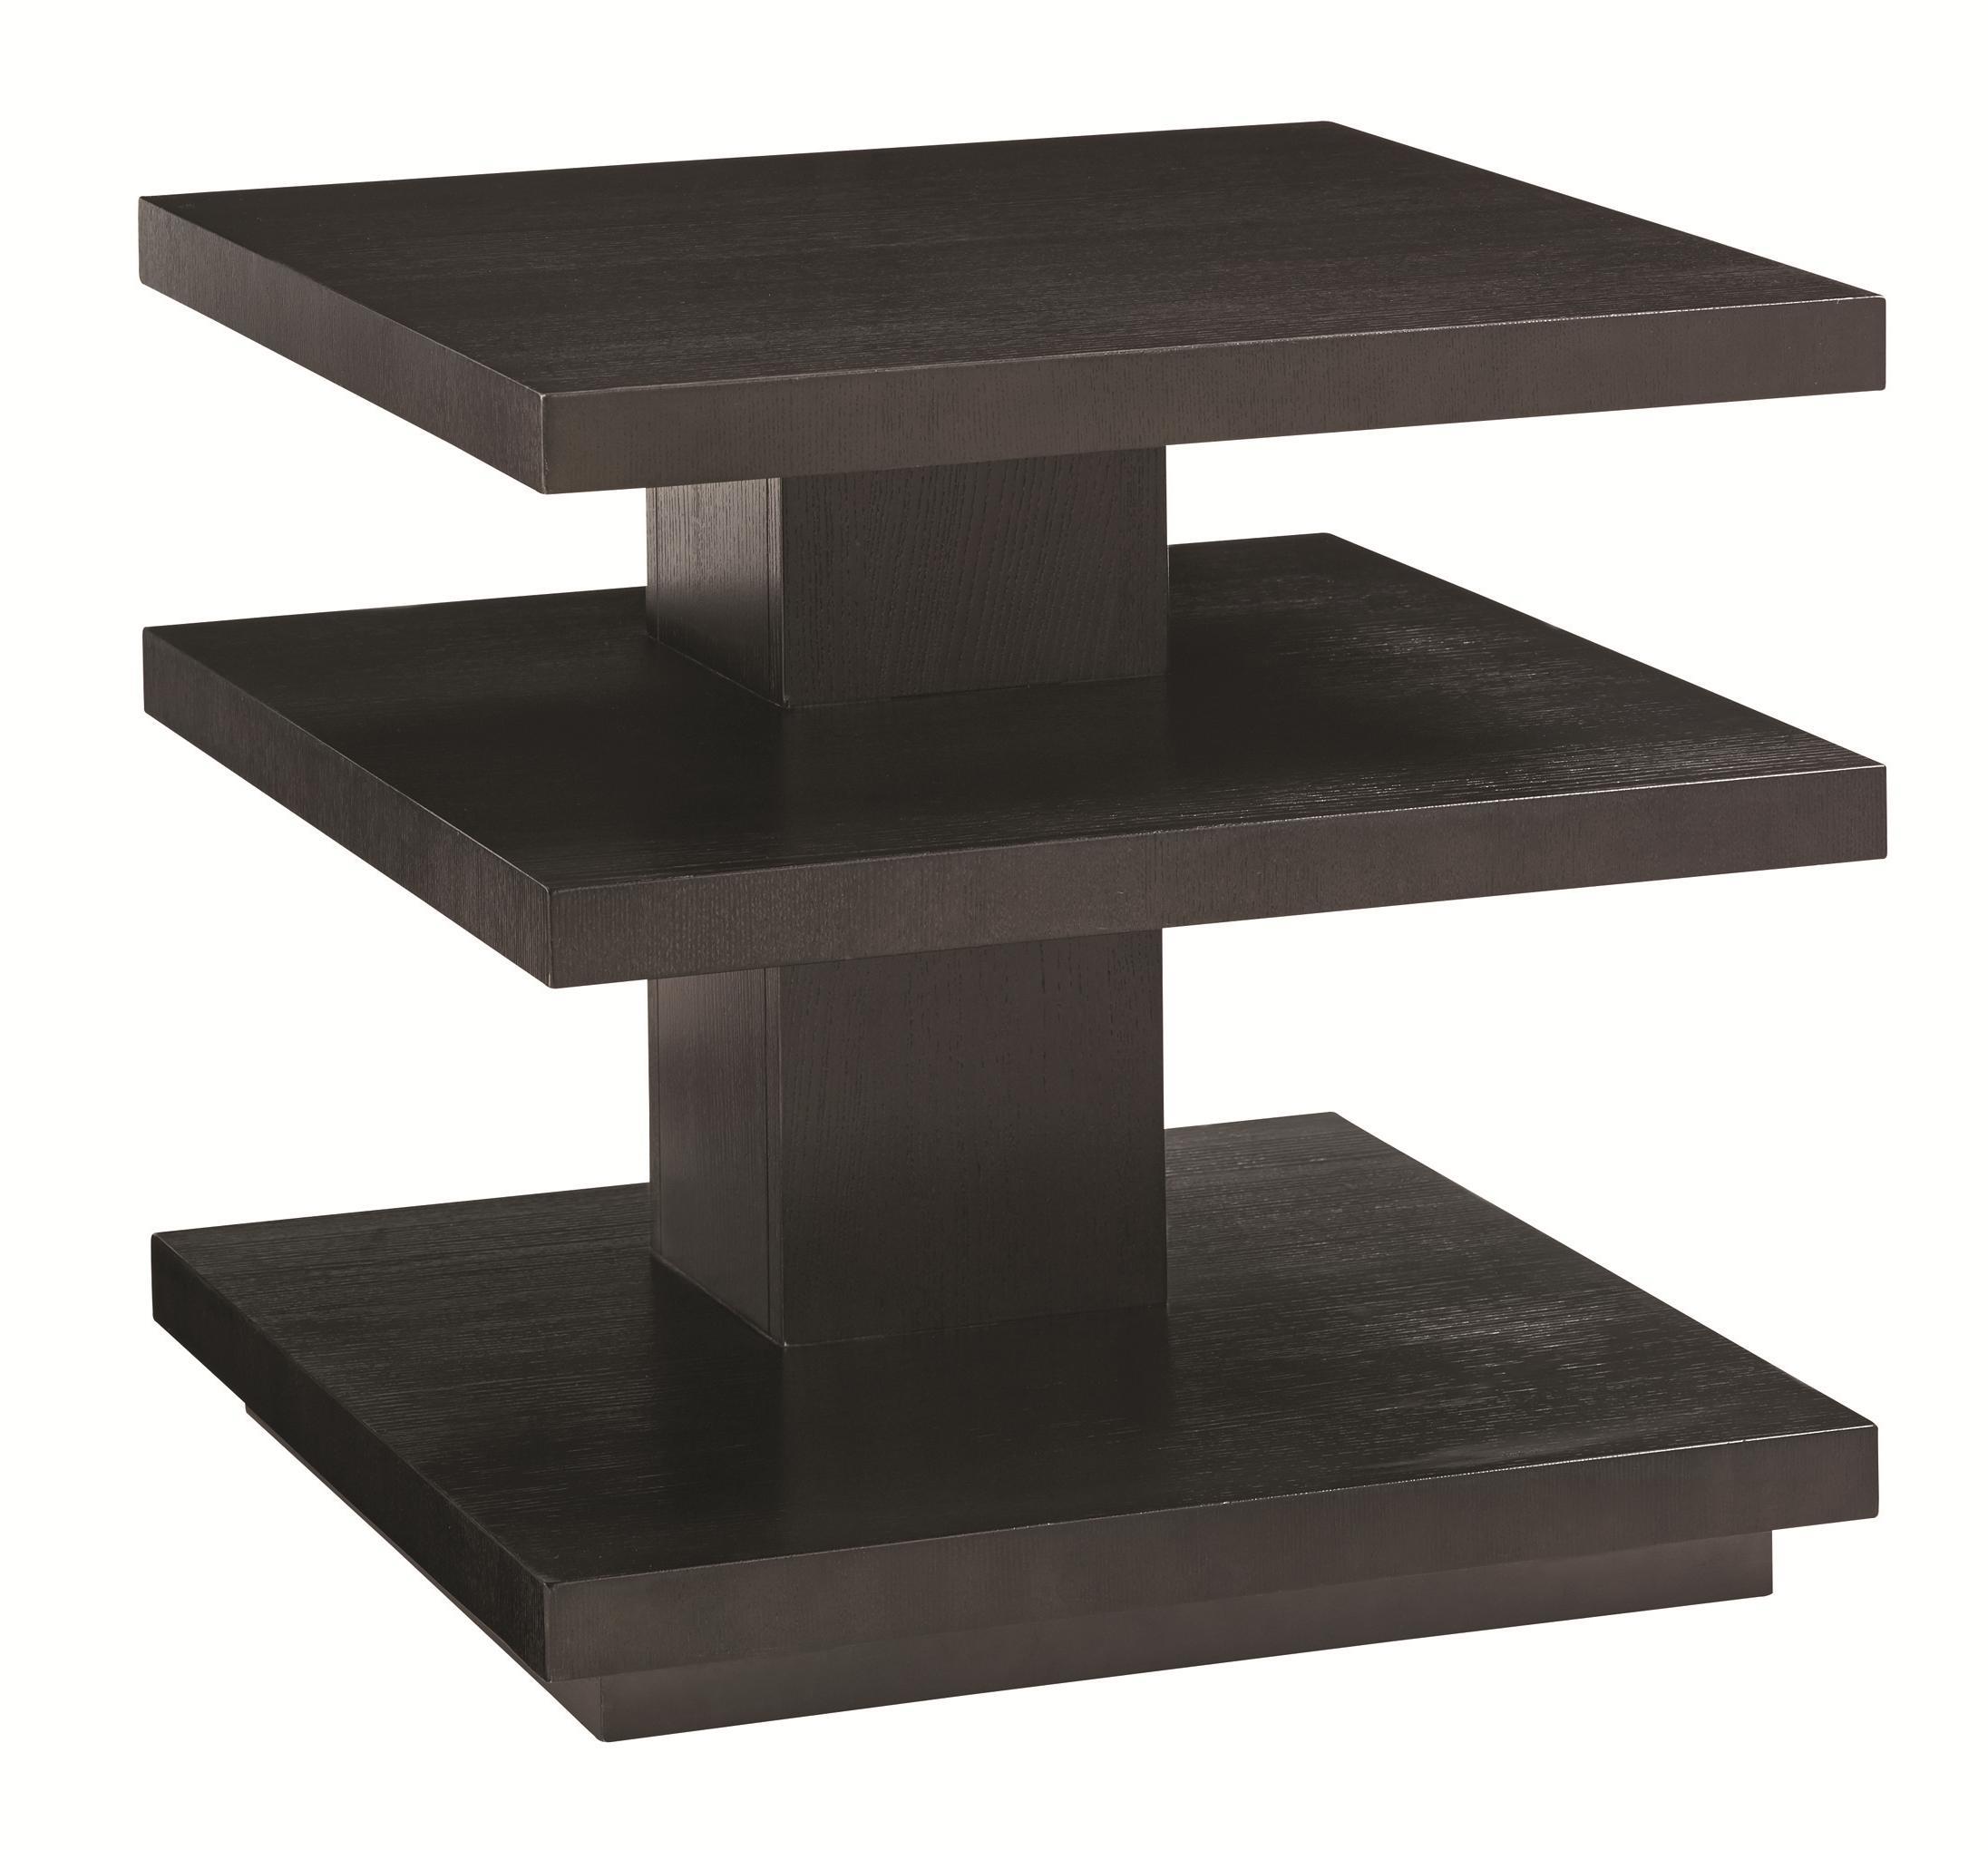 Carrera Ellena Square End Table by Lexington at Baer's Furniture